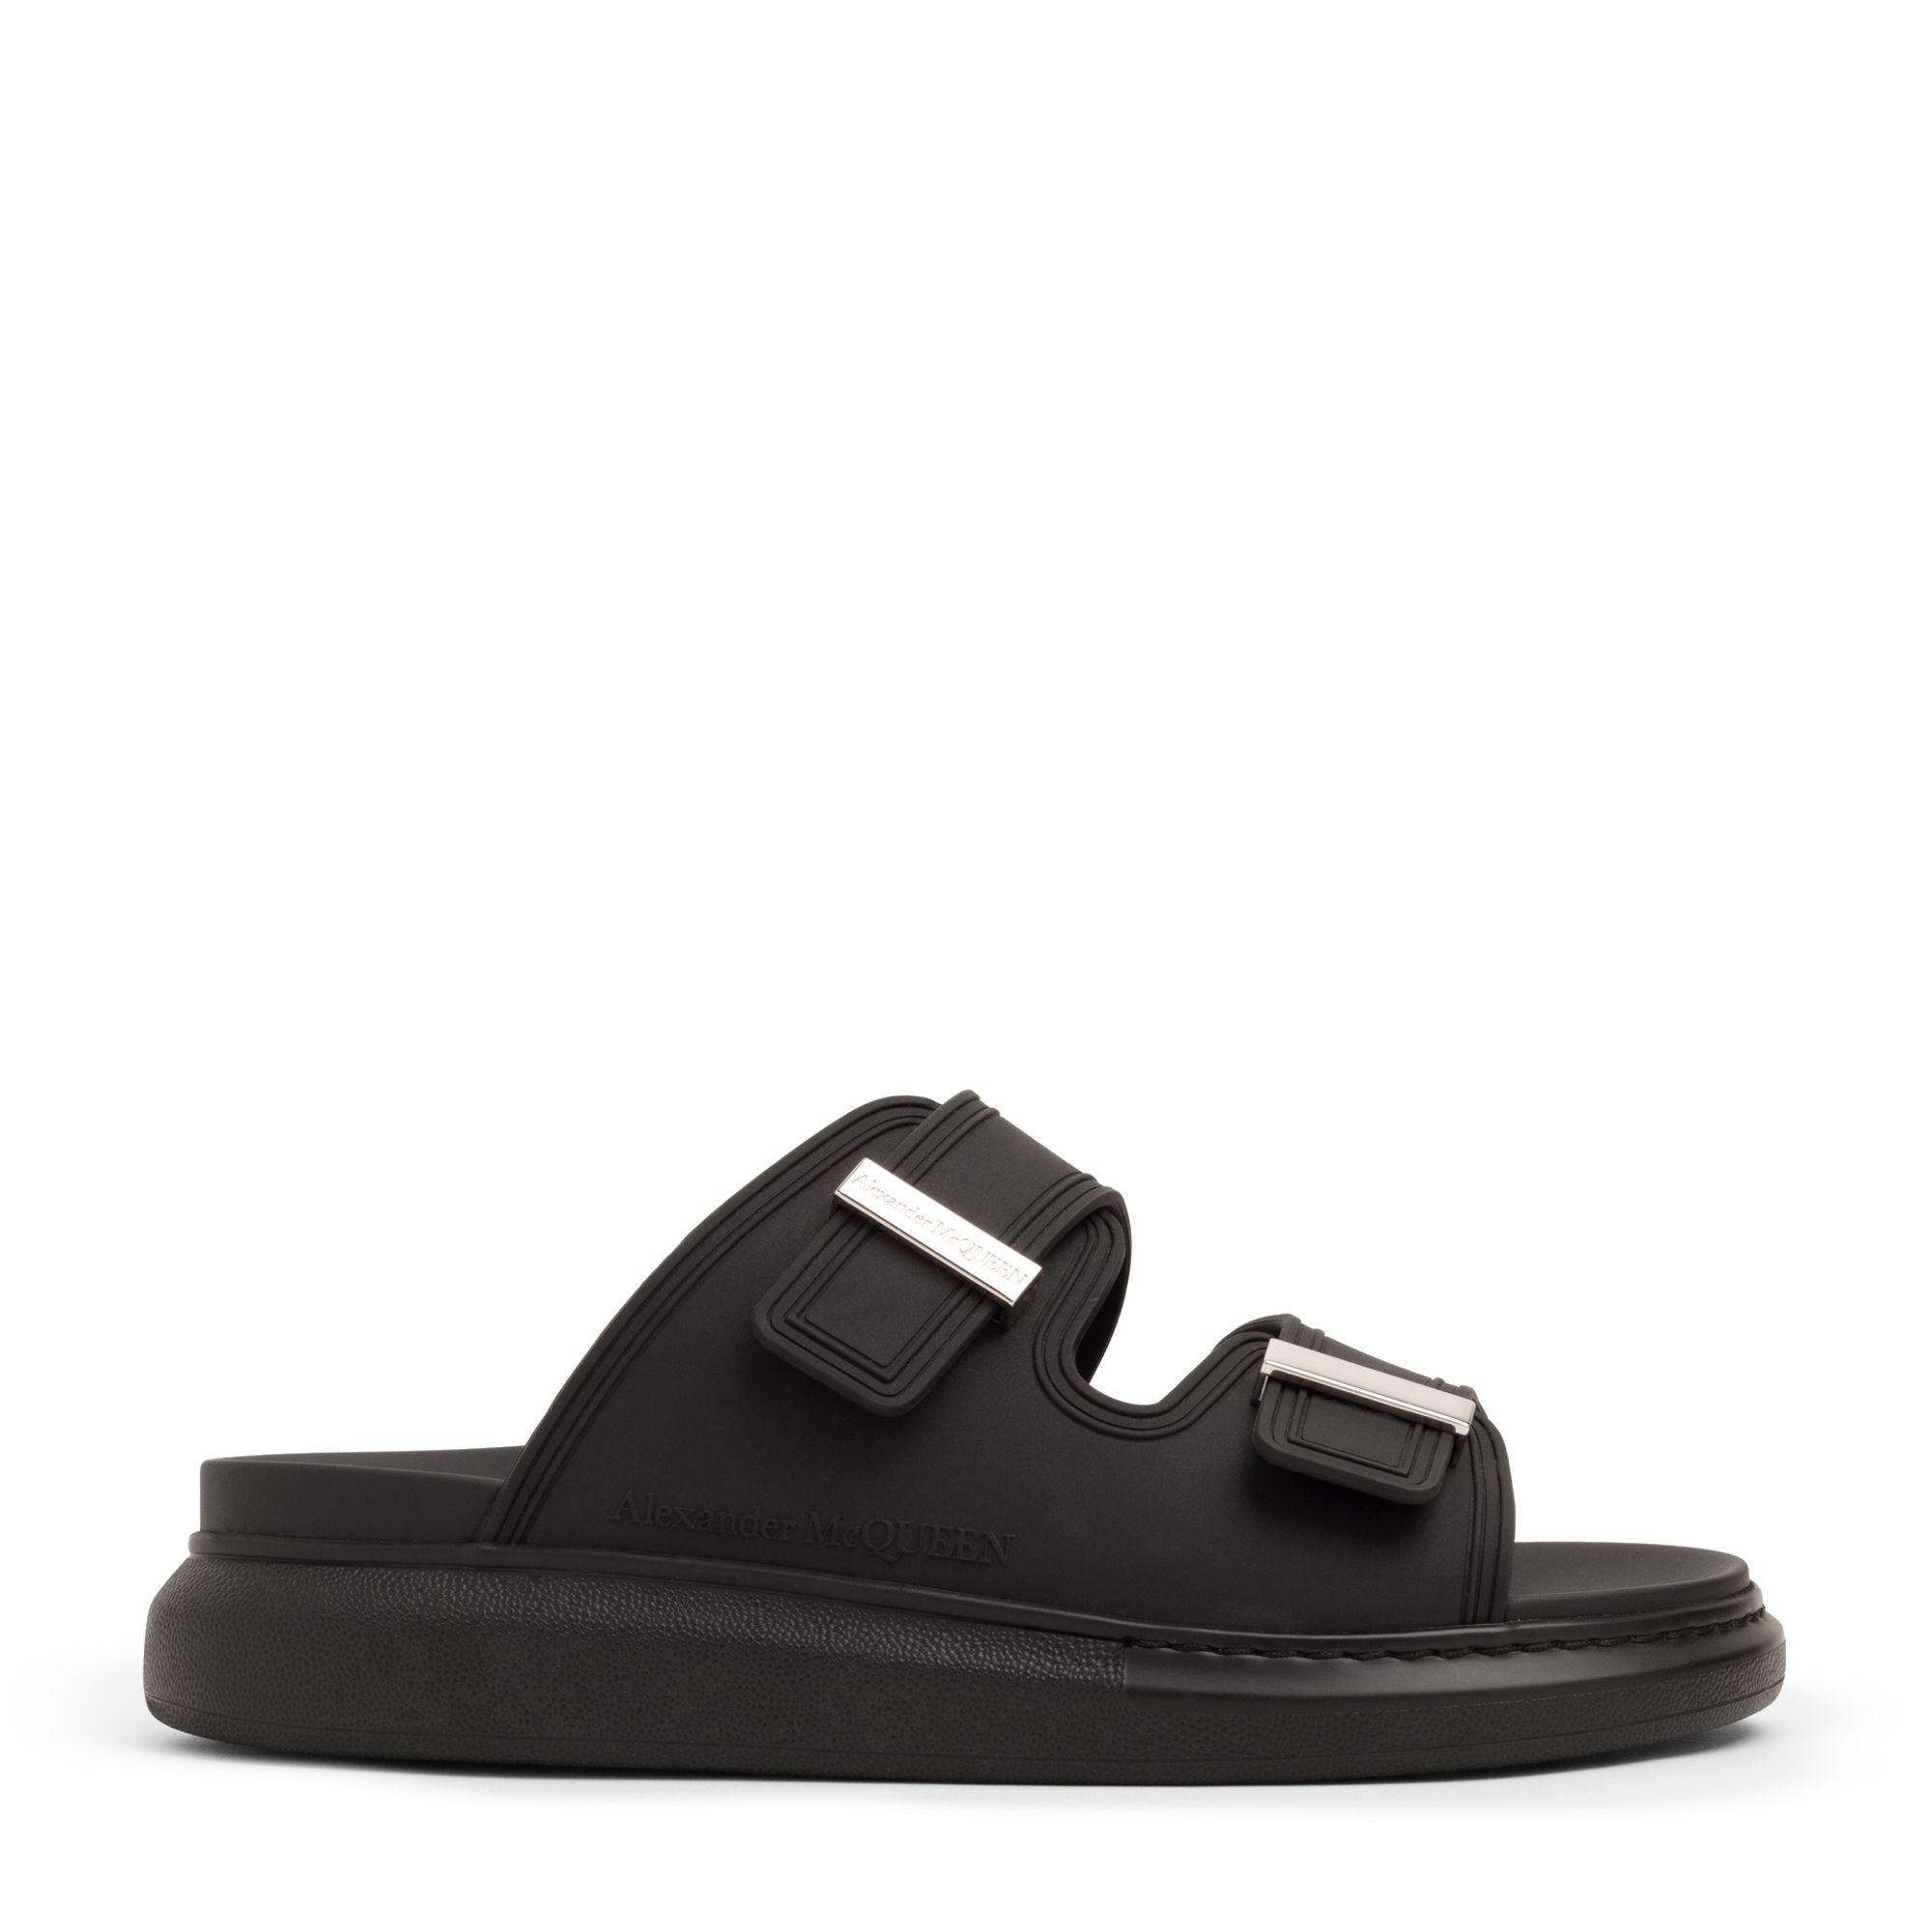 Hybrid sandals